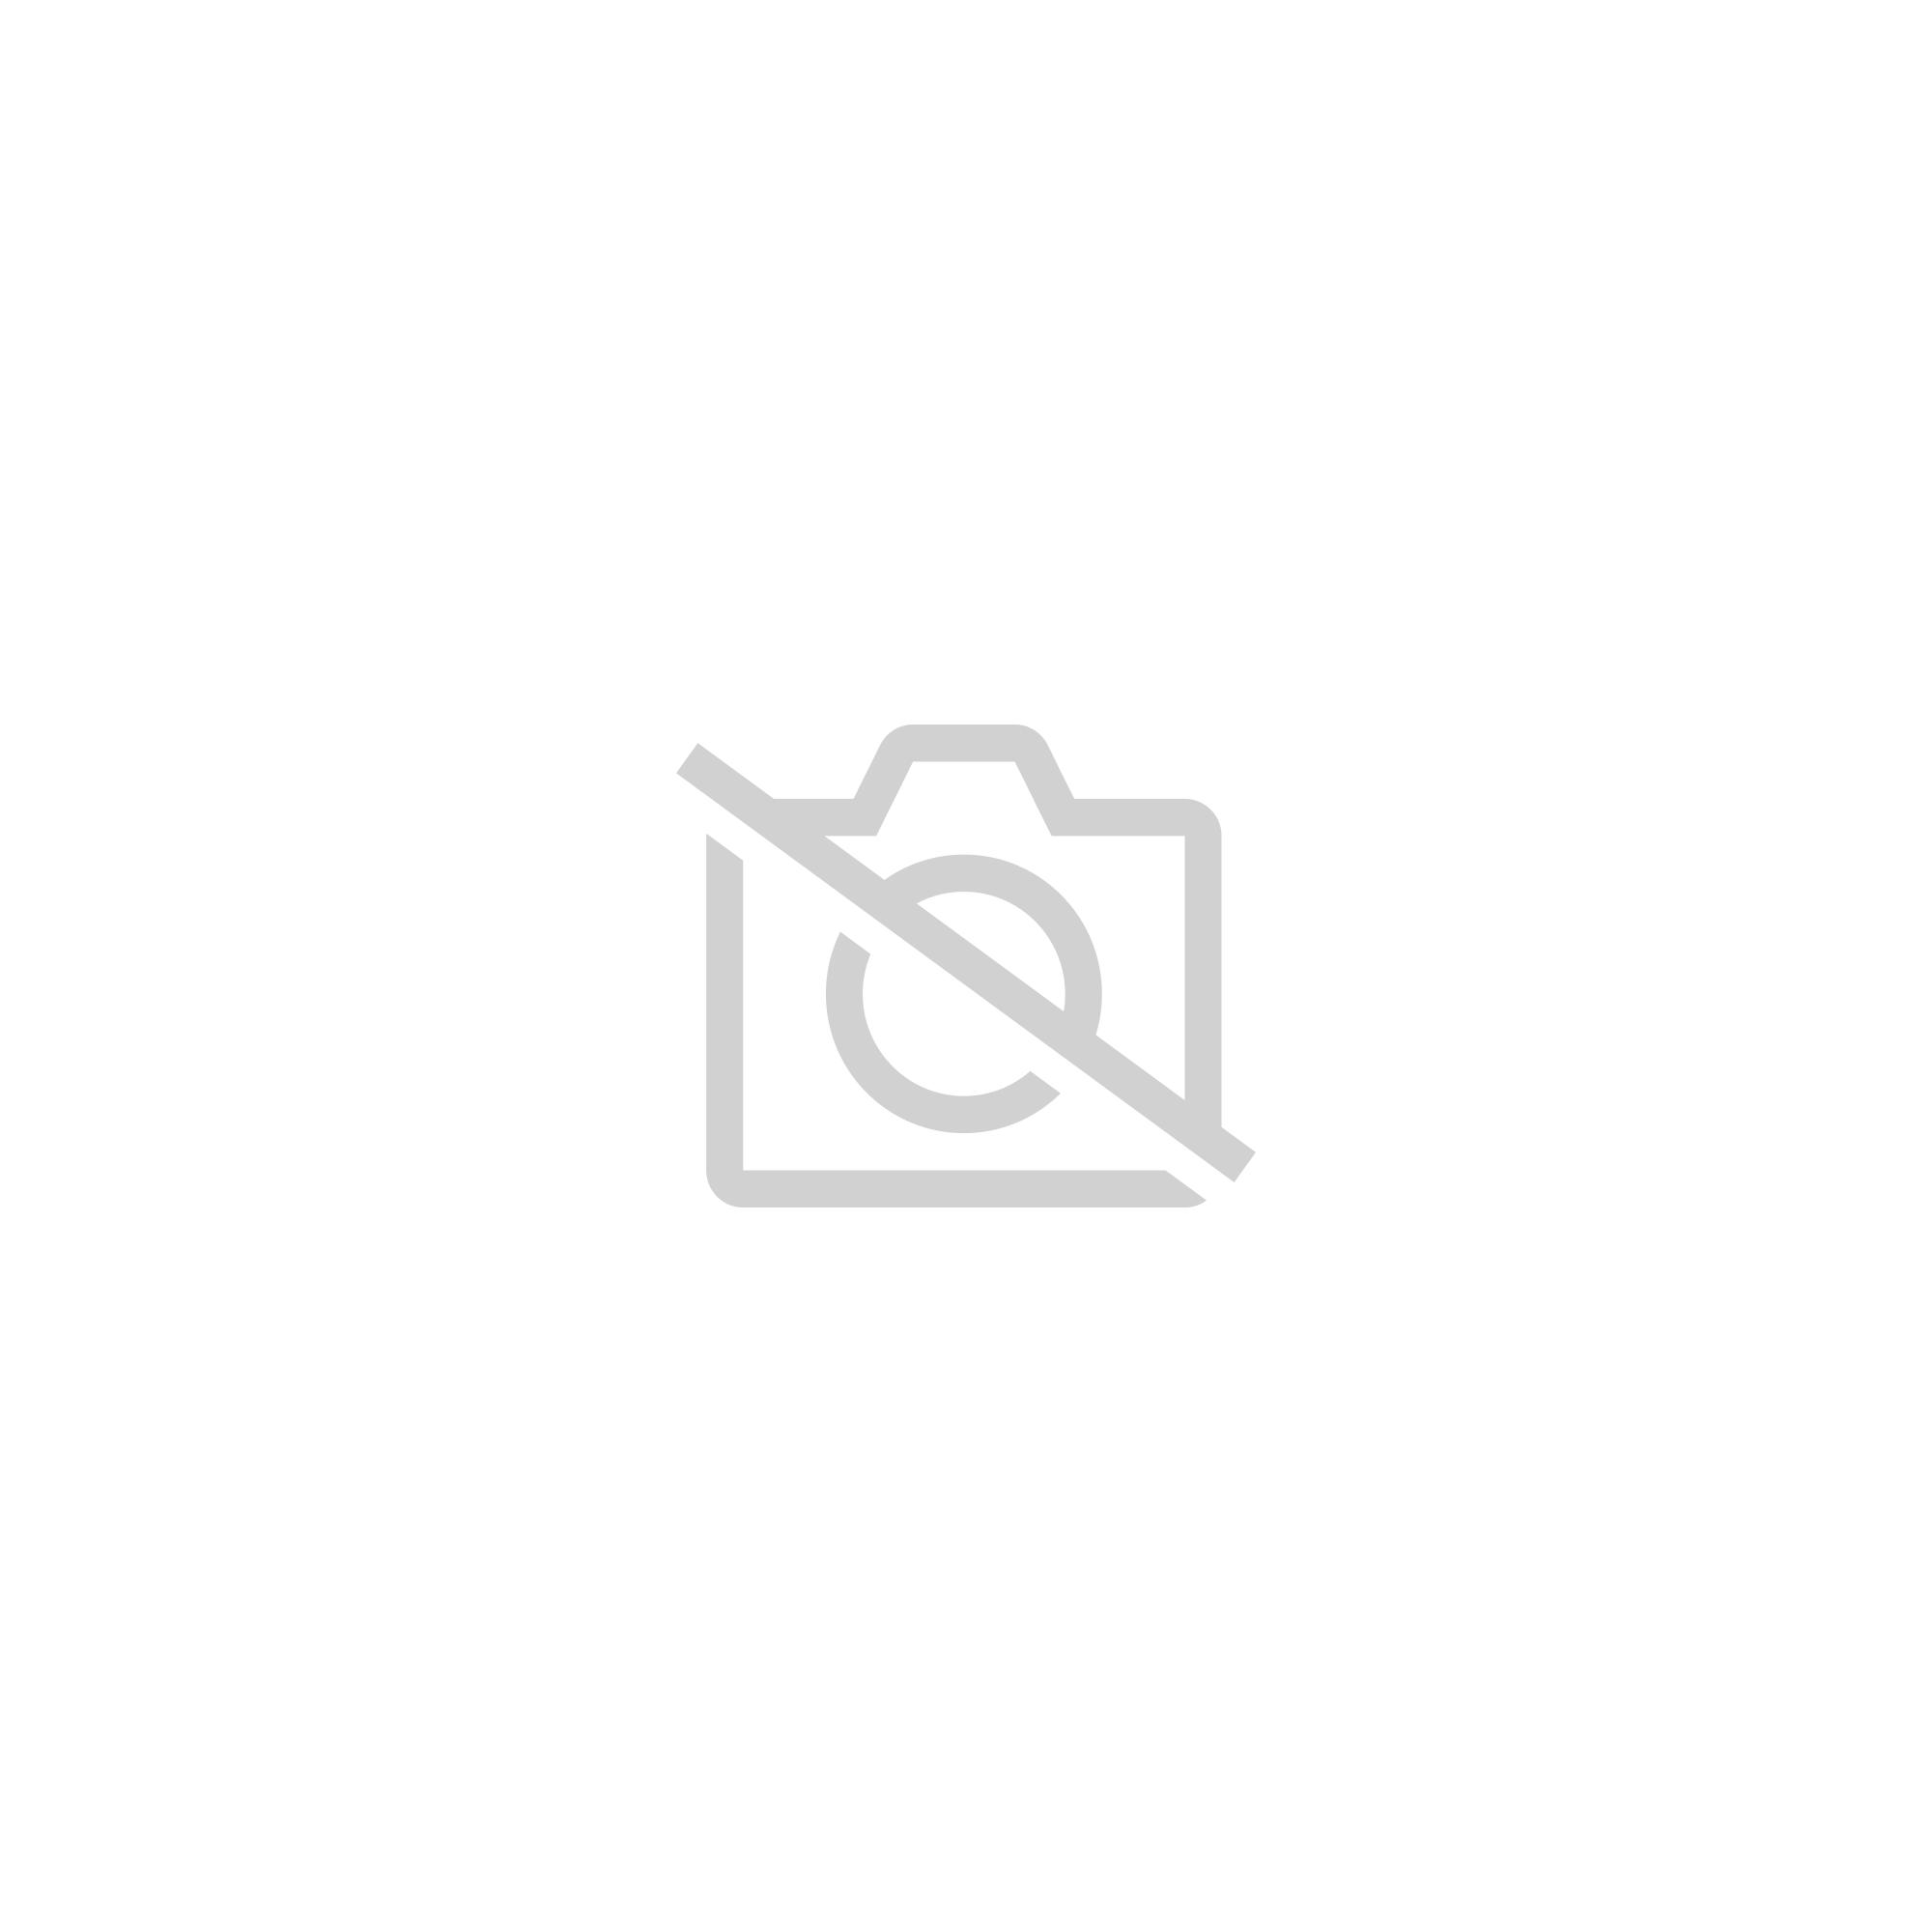 Paire De Chaussures Everlast Bf